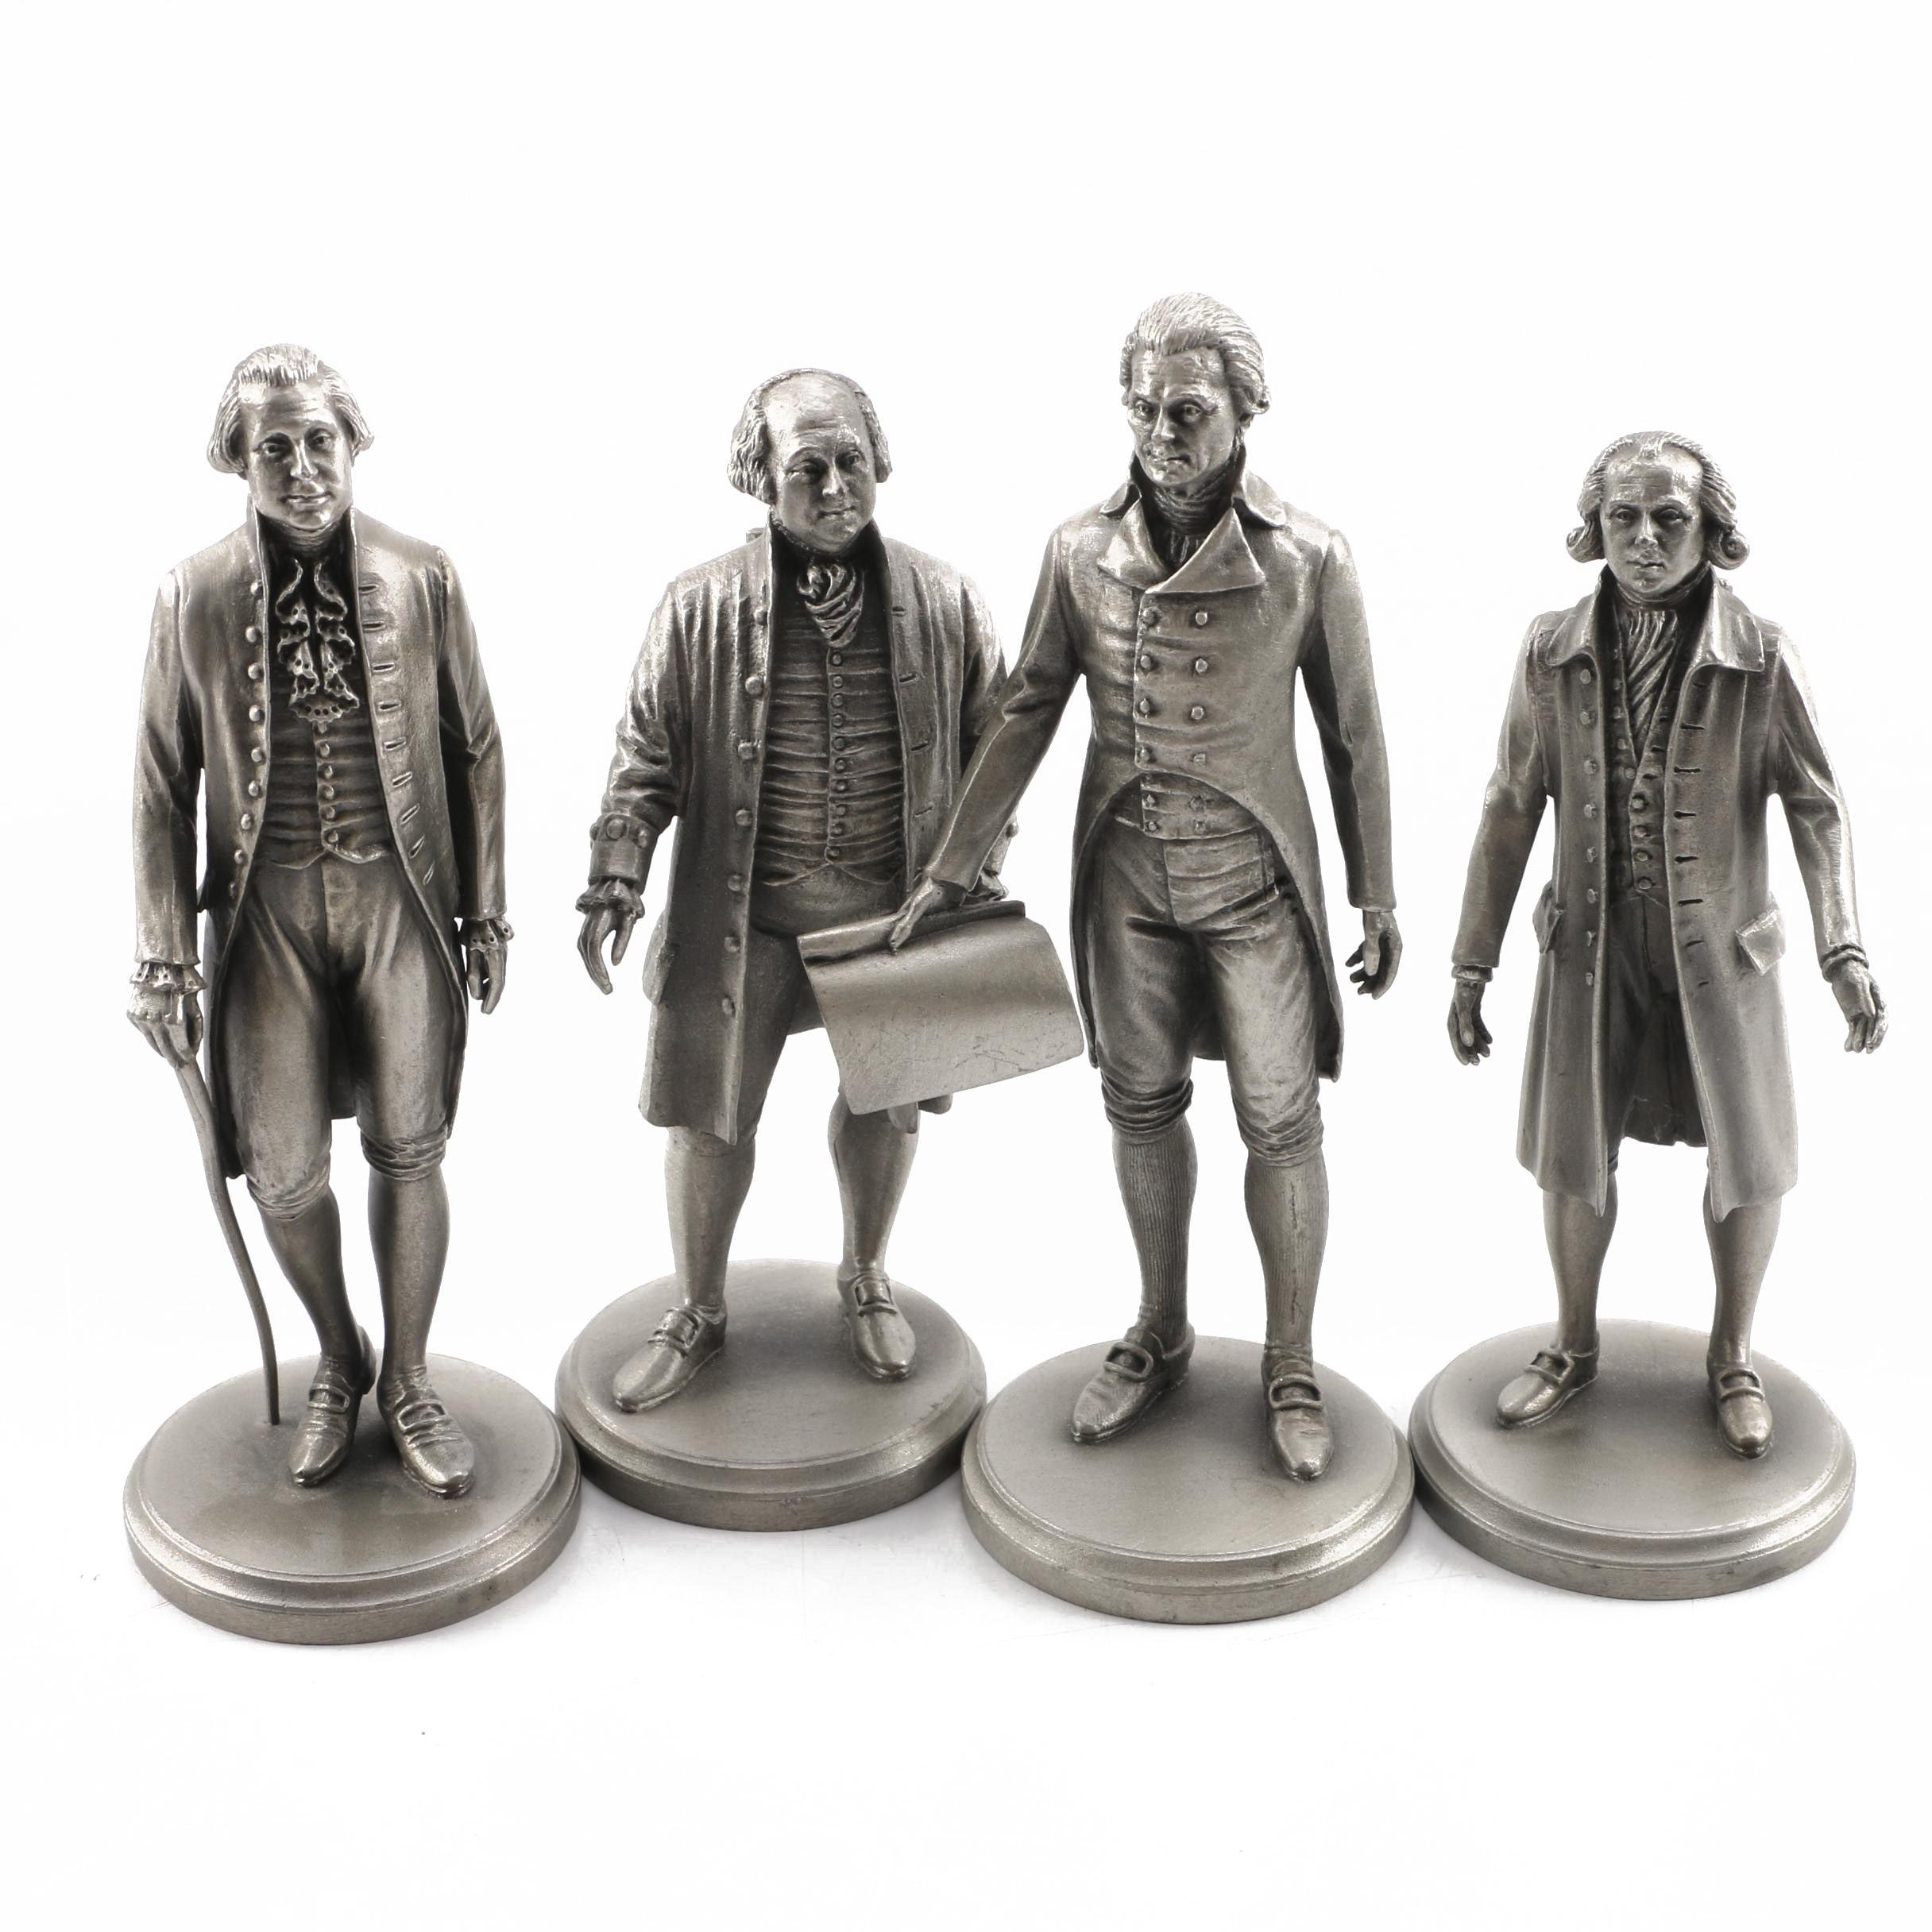 Lance Pewter President Figures including Washington, Adams, Jefferson, and Madis